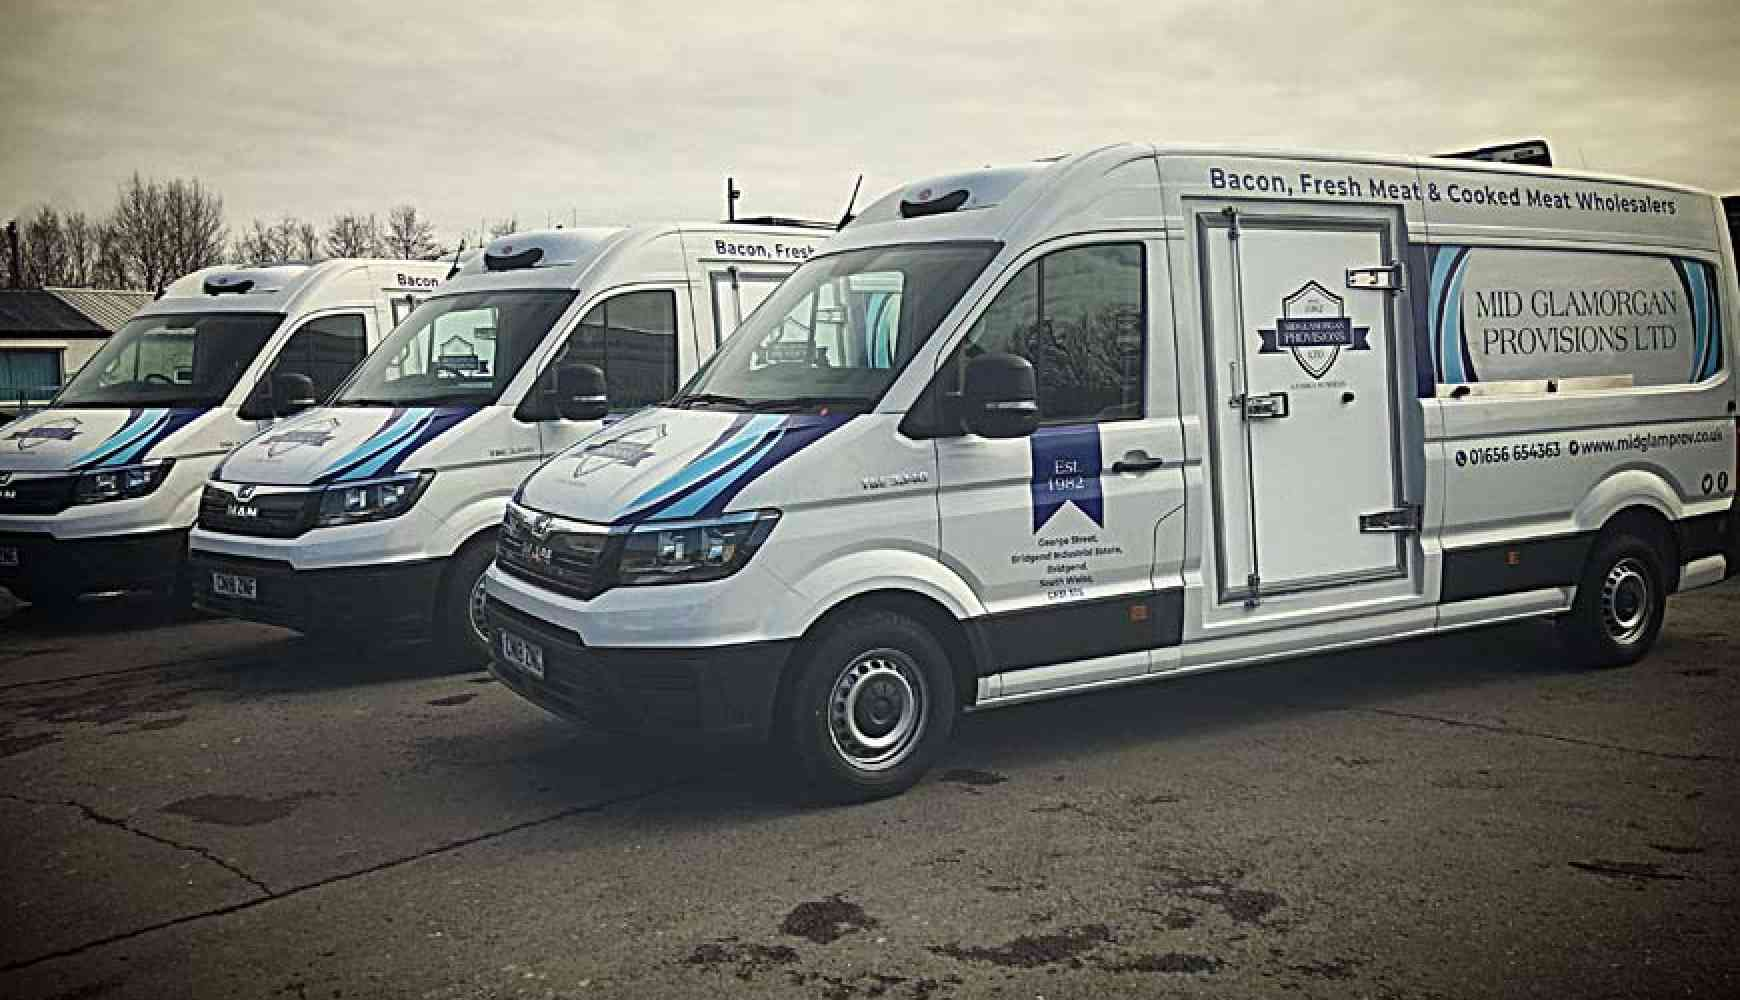 Mid Glamorgan Provisions take 3 brand new MAN TGE Fridge/Freezer Vans